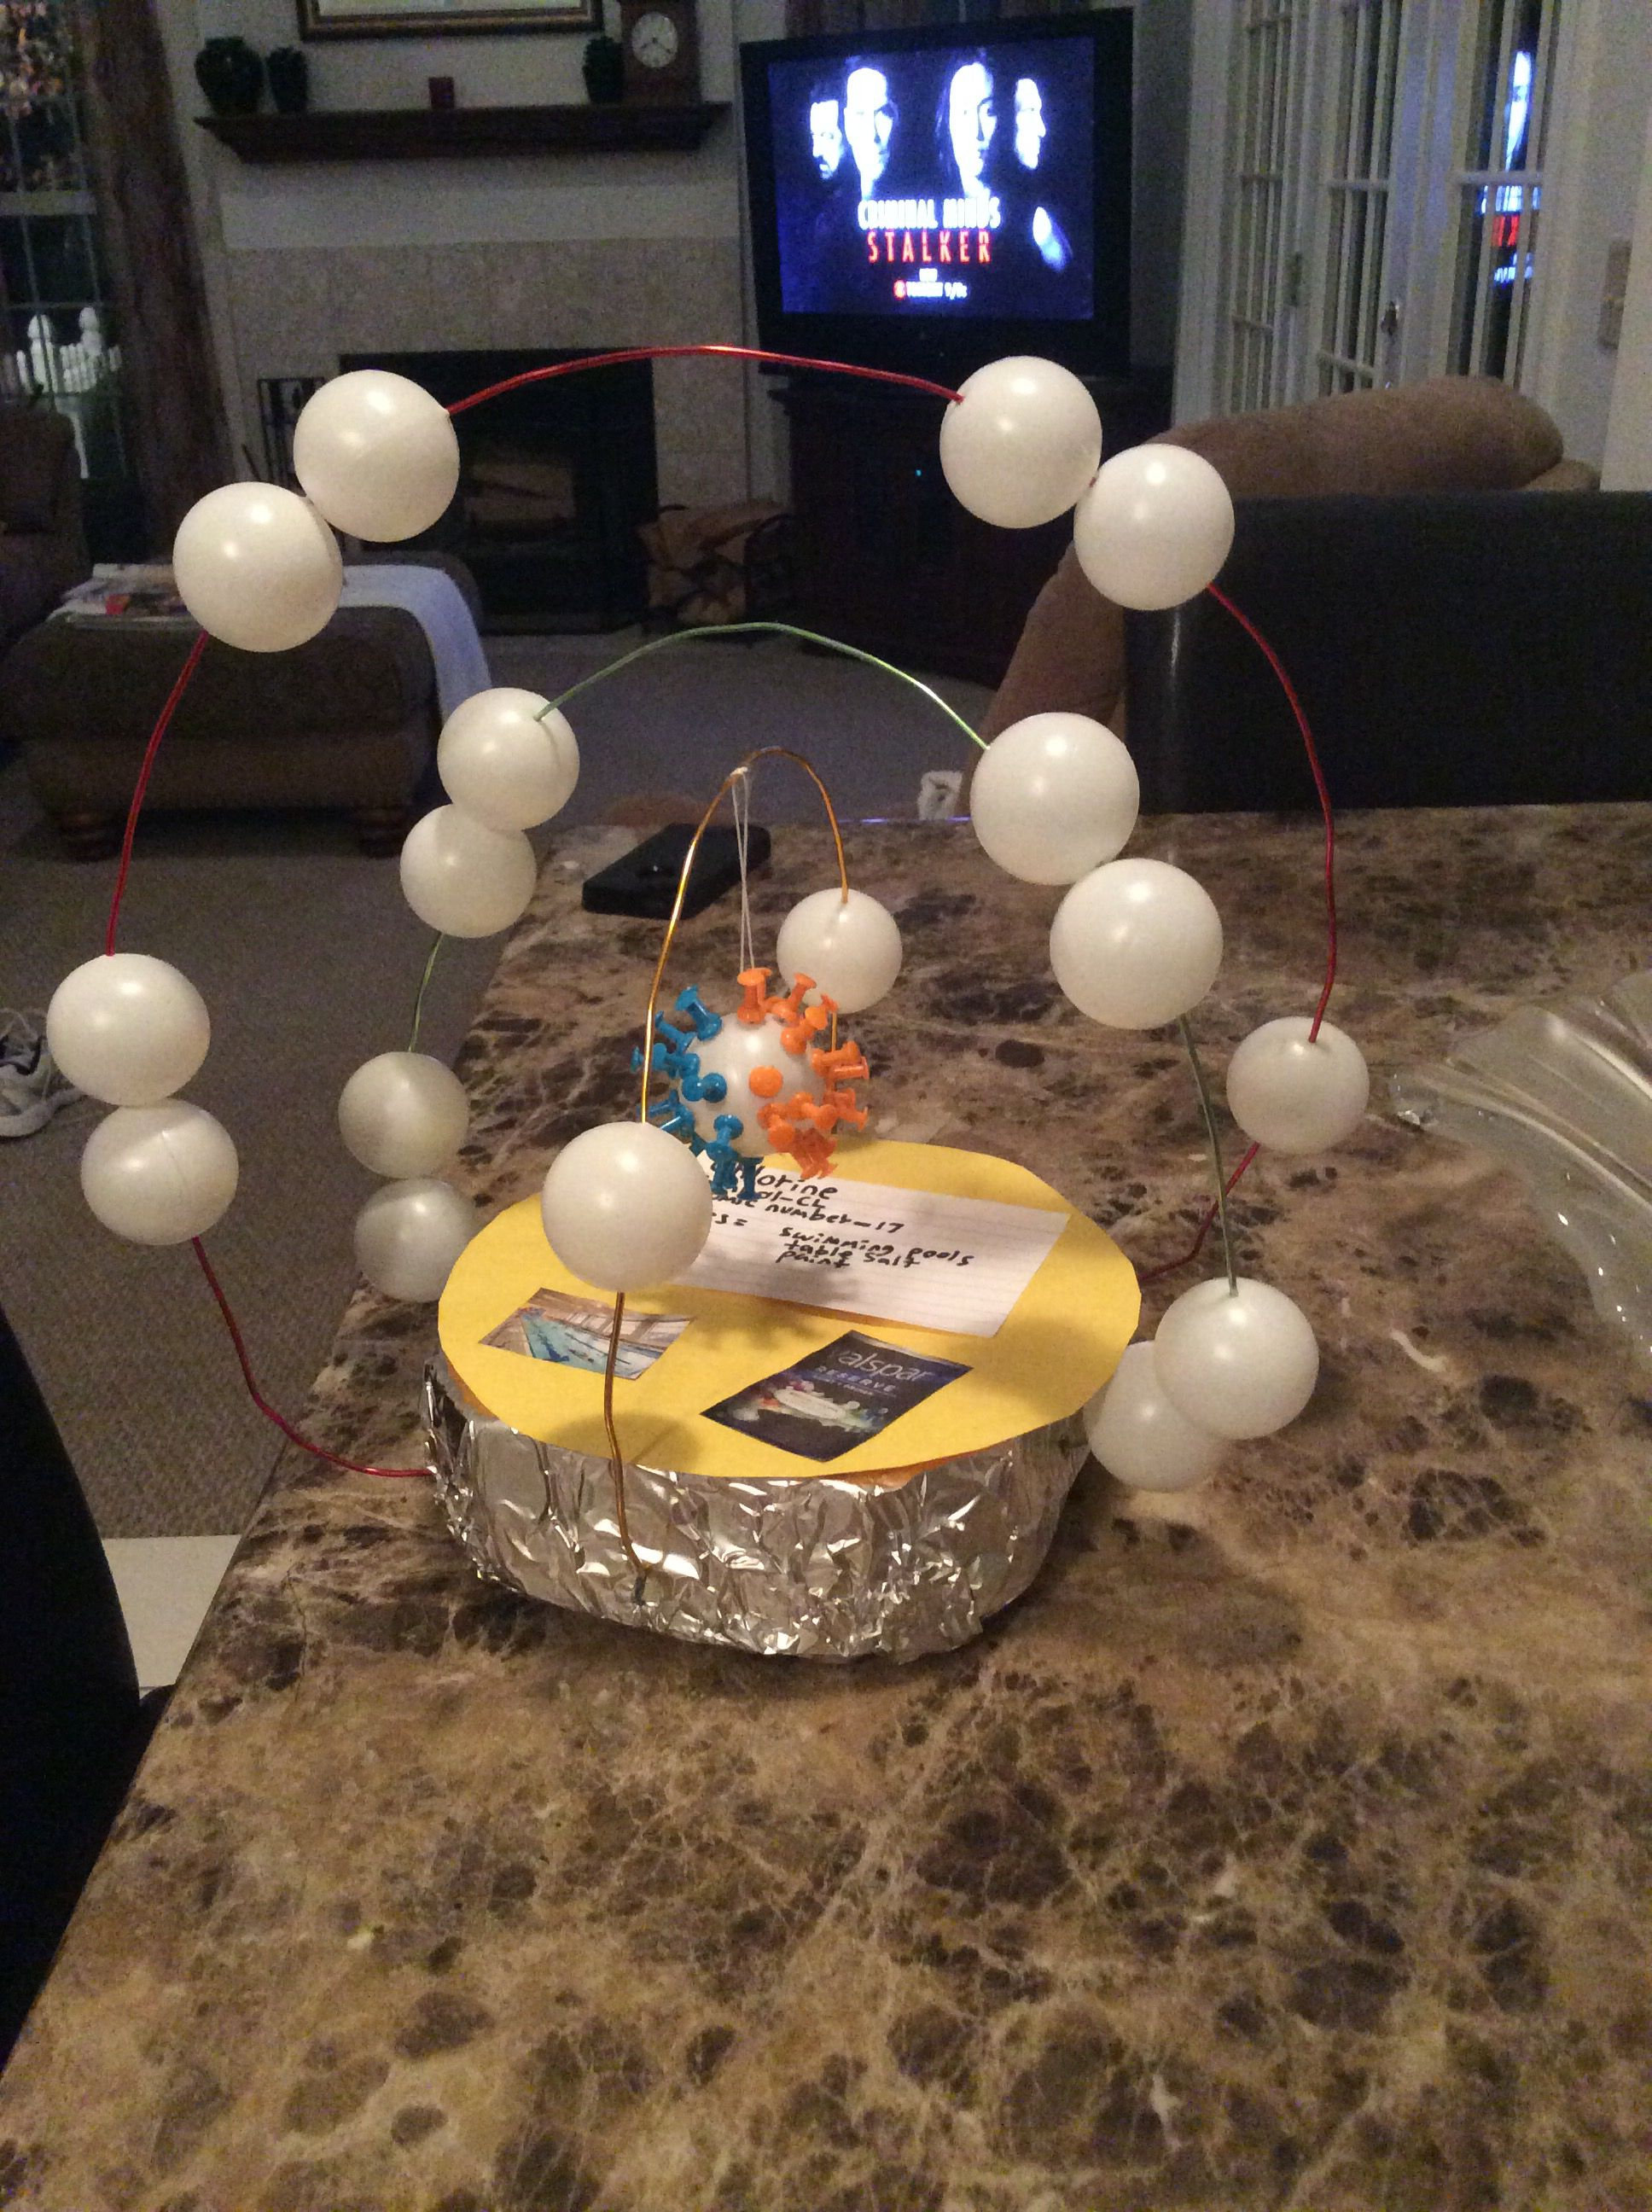 Ryans atom model of chlorine great ideas pinterest atom ryans atom model of chlorine biocorpaavc